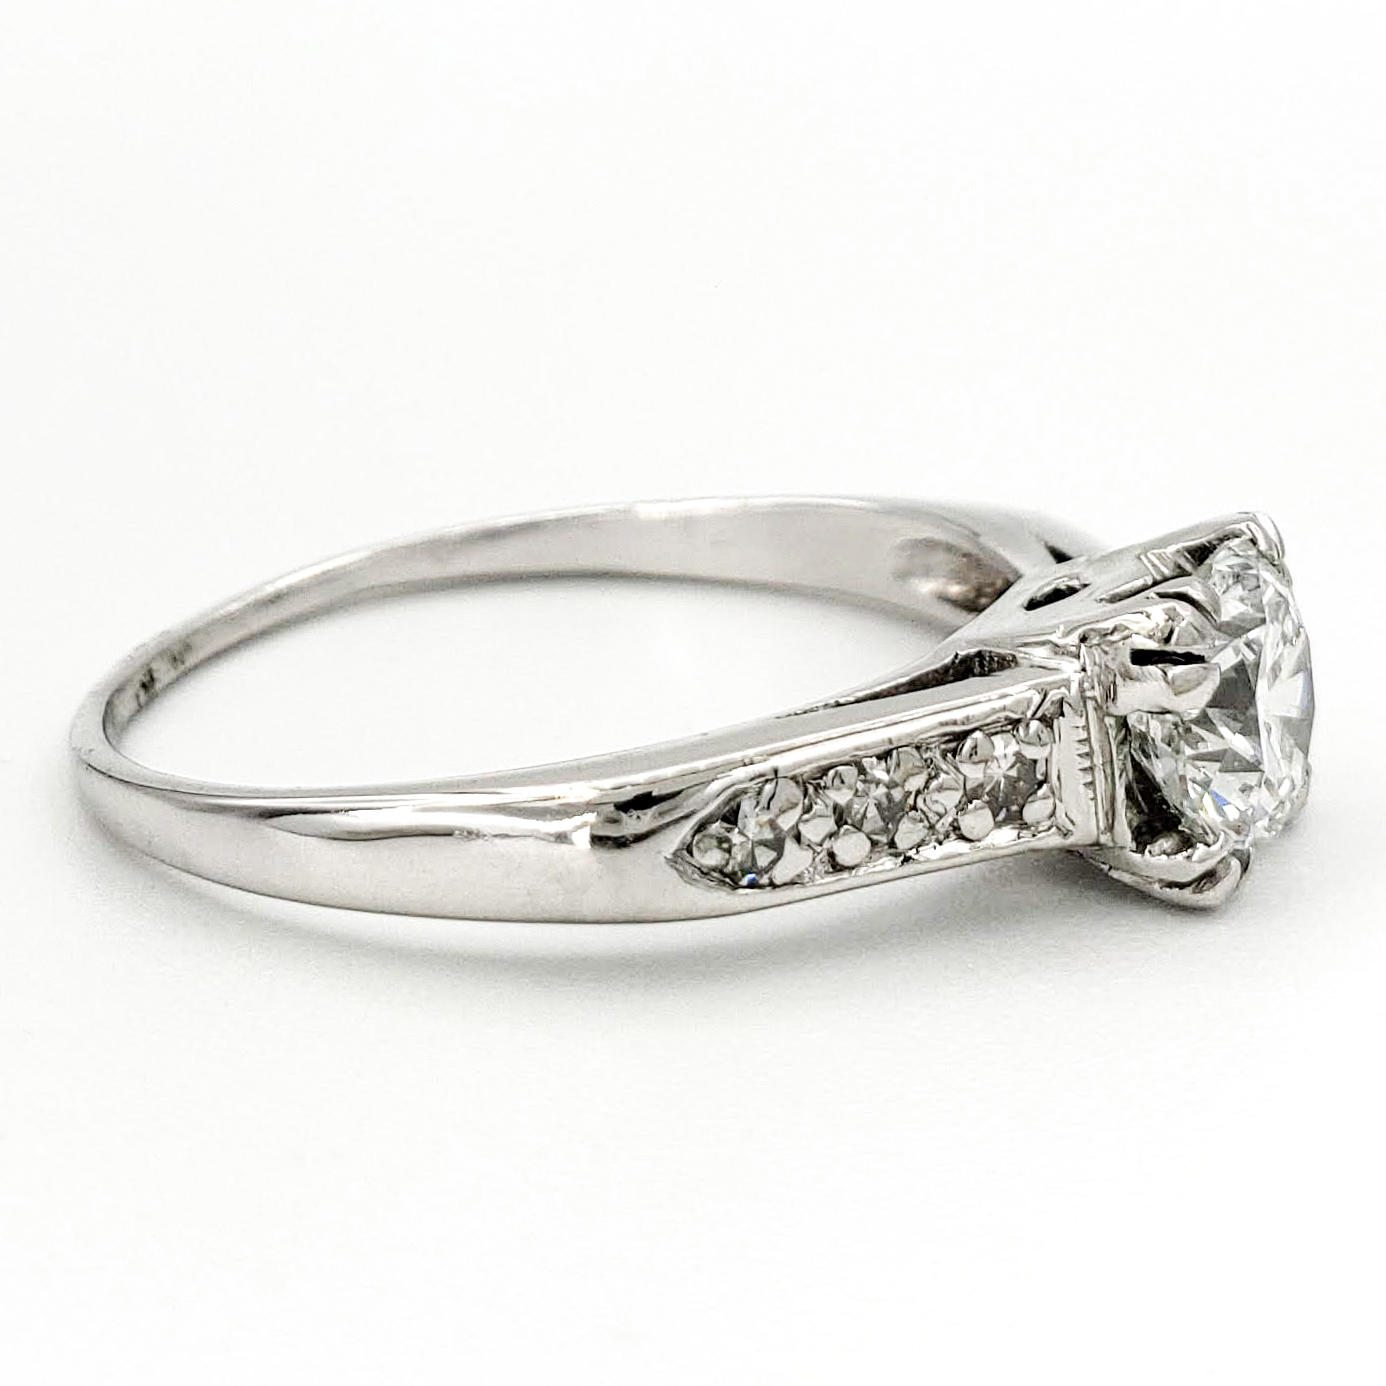 vintage-platinum-engagement-ring-with-0-72-carat-round-brilliant-cut-diamond-gia-d-vs1